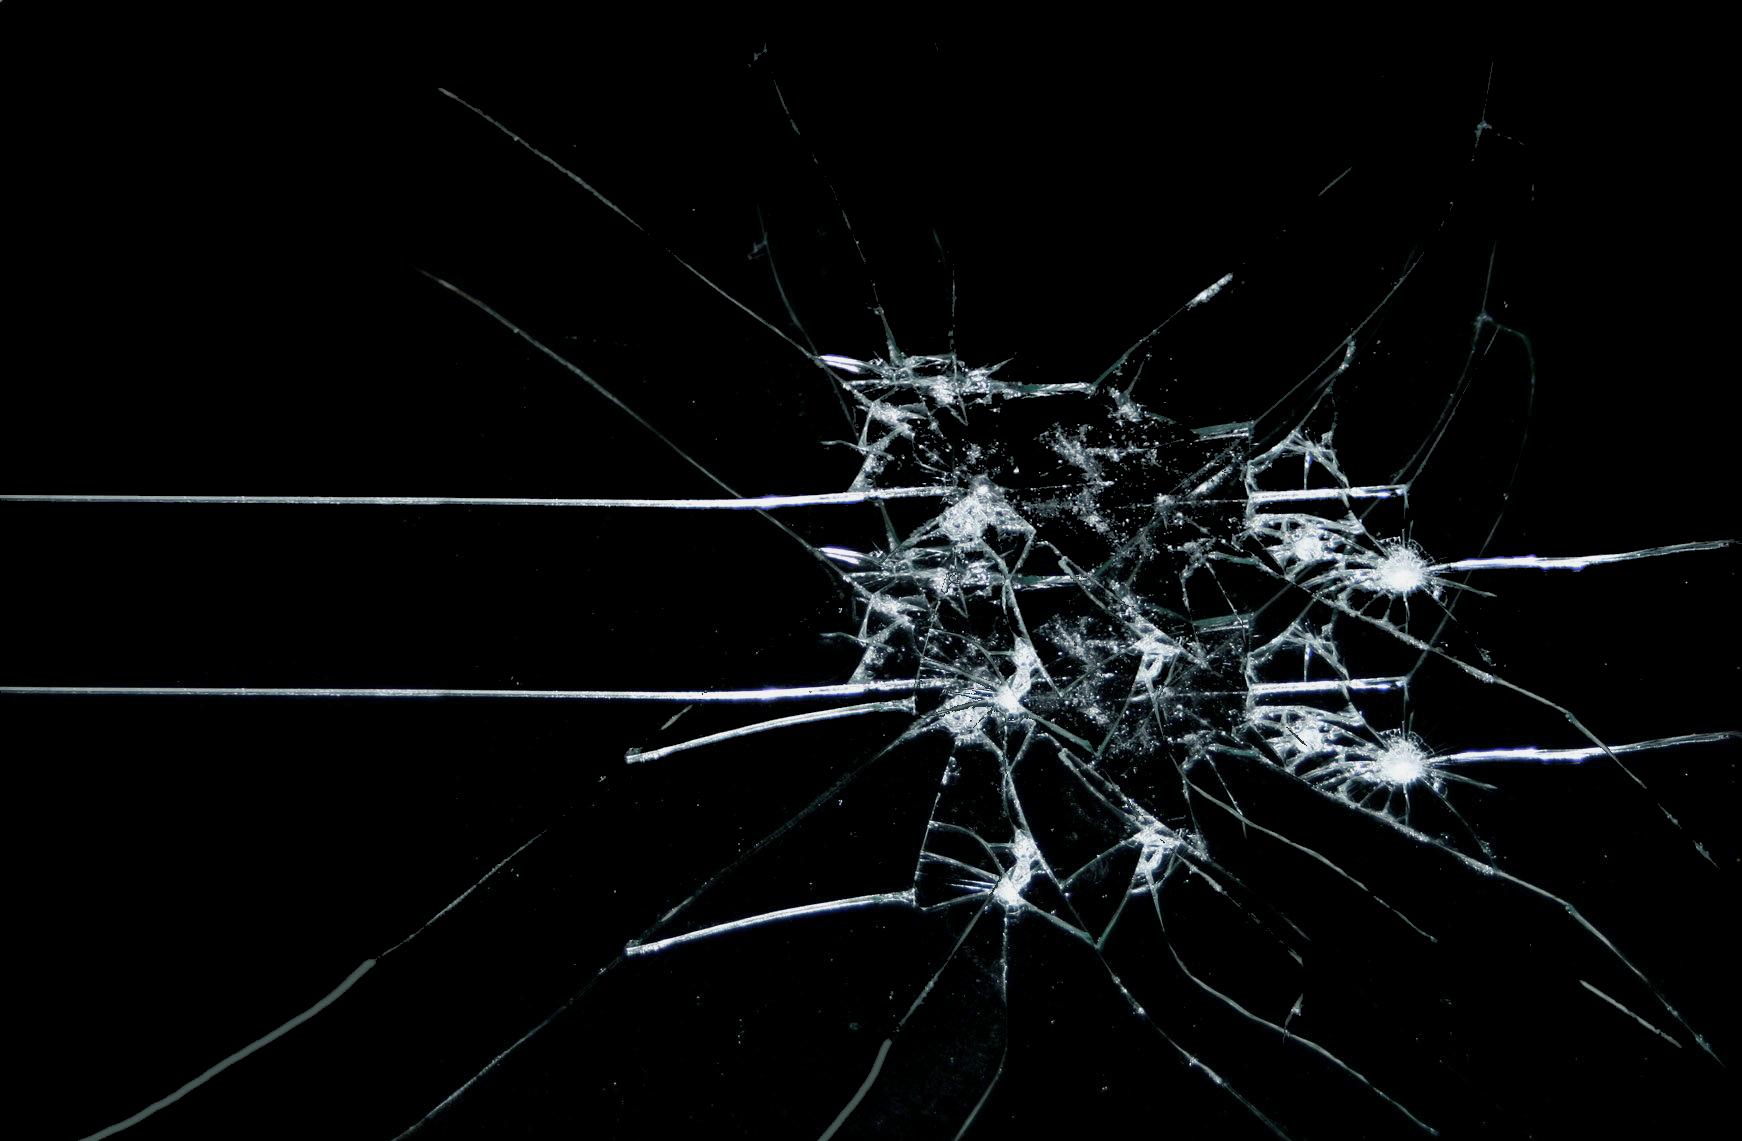 Broken Glass PNG Transparent Images, Pictures, Photos.